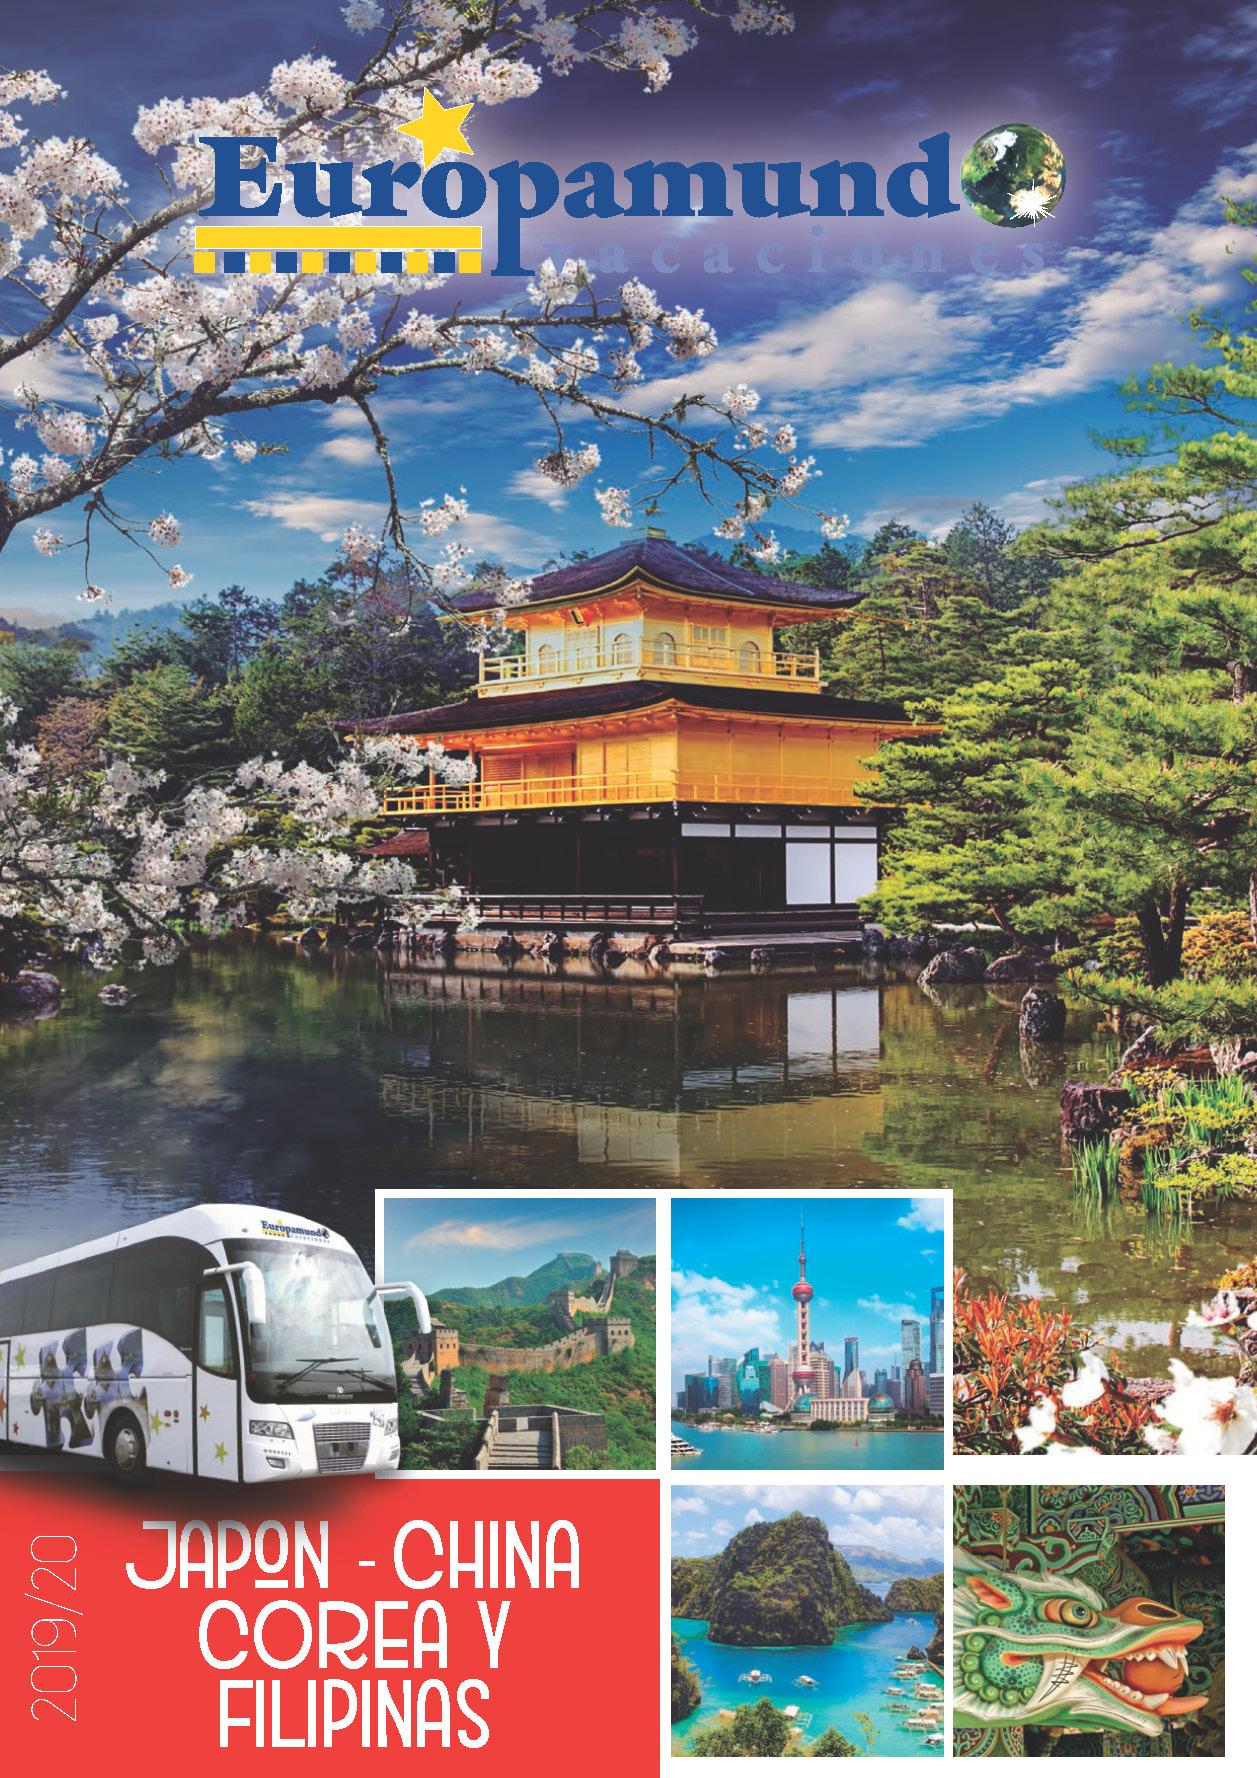 Catalogo Europamundo Japon China Corea y Filipinas 2019